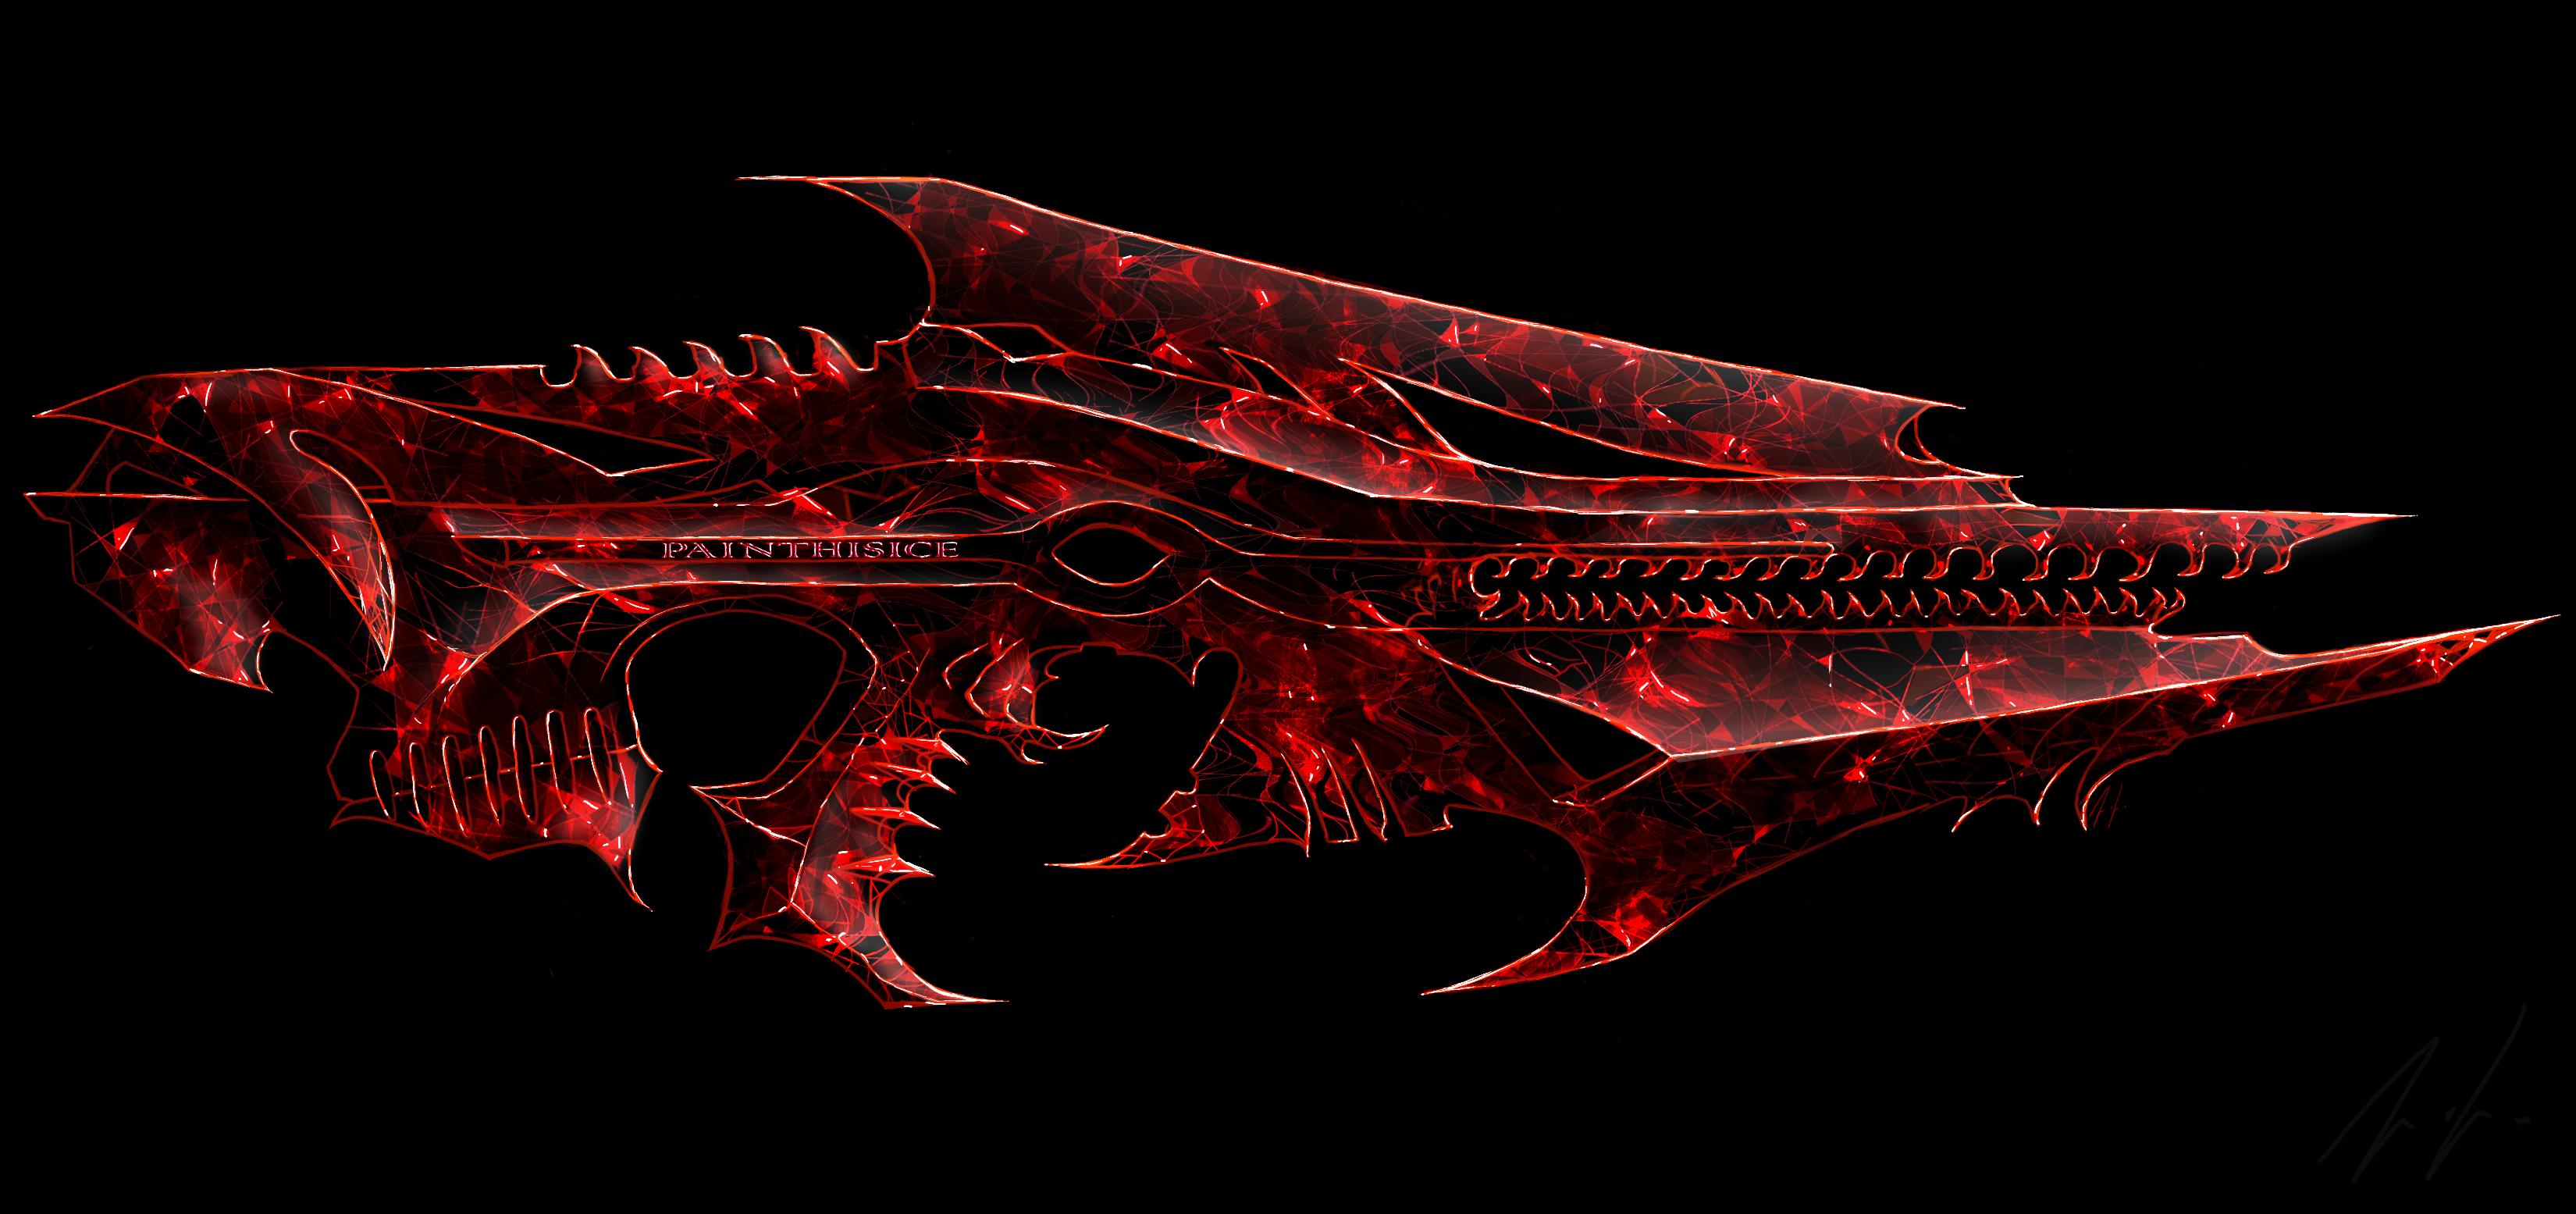 Fang of Balwur (Necrochasm)